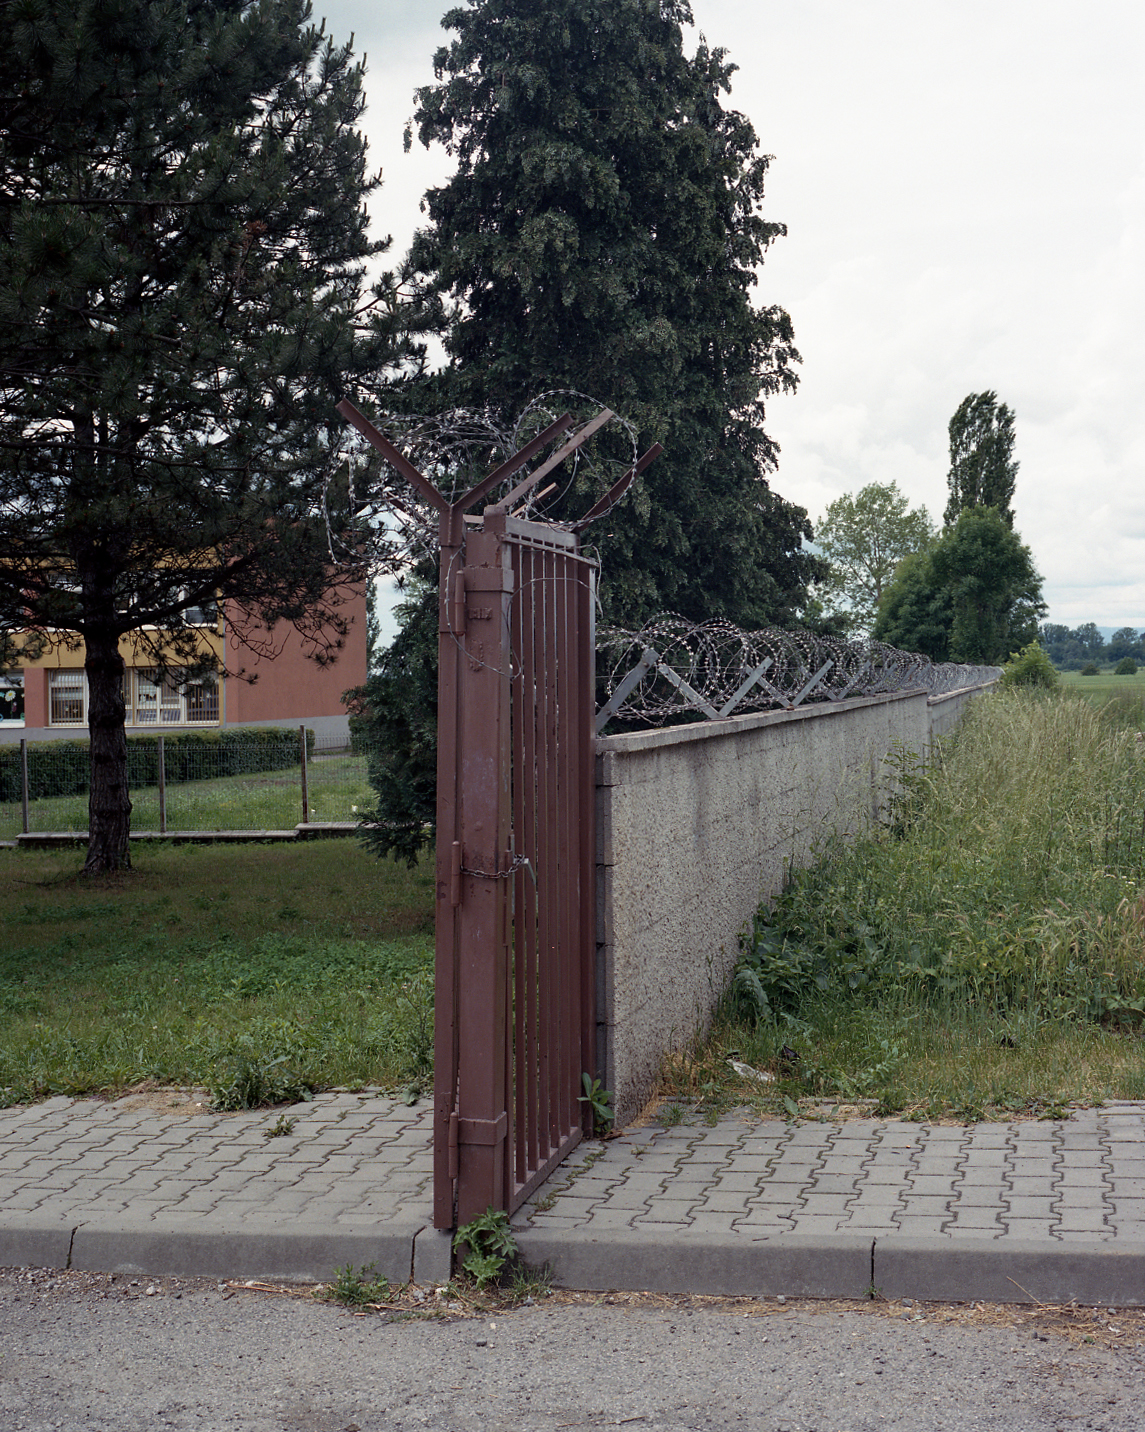 Olga_Sokal_03%22Enterance to Roma school in Velka Ida, Slovakia%22.jpg